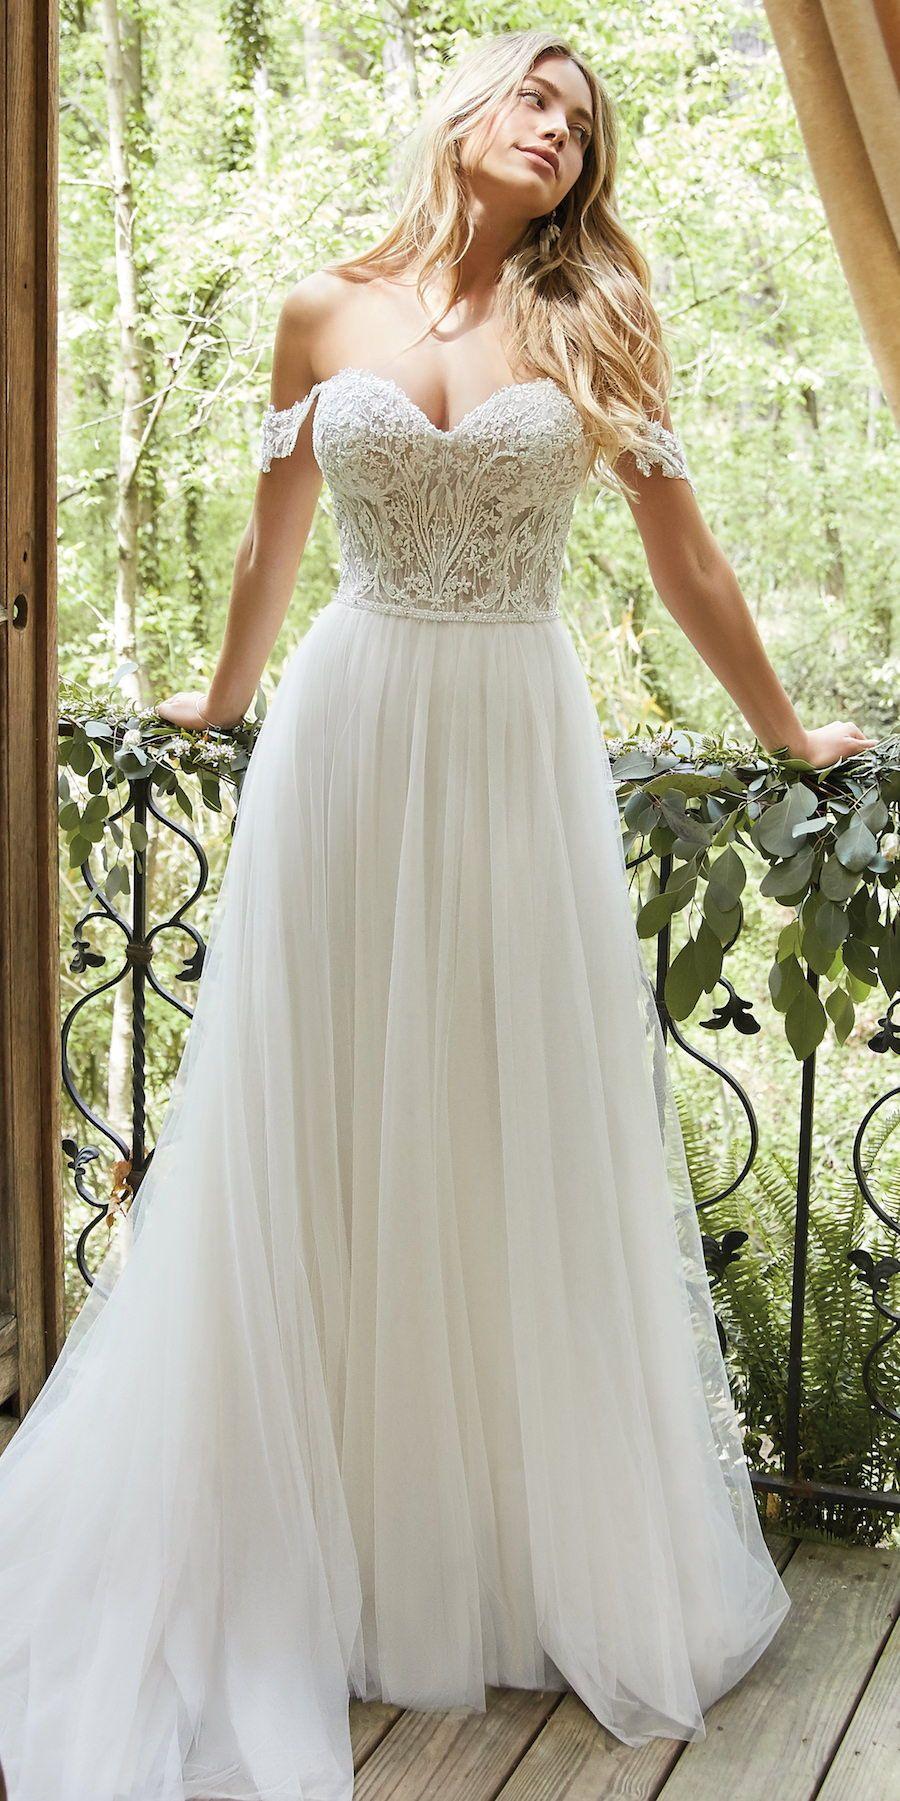 Nia By Rebecca Ingram Wedding Dresses And Accessories Wedding Dresses Beaded Bodice Wedding Dress Wedding Dresses Lace [ 1801 x 900 Pixel ]